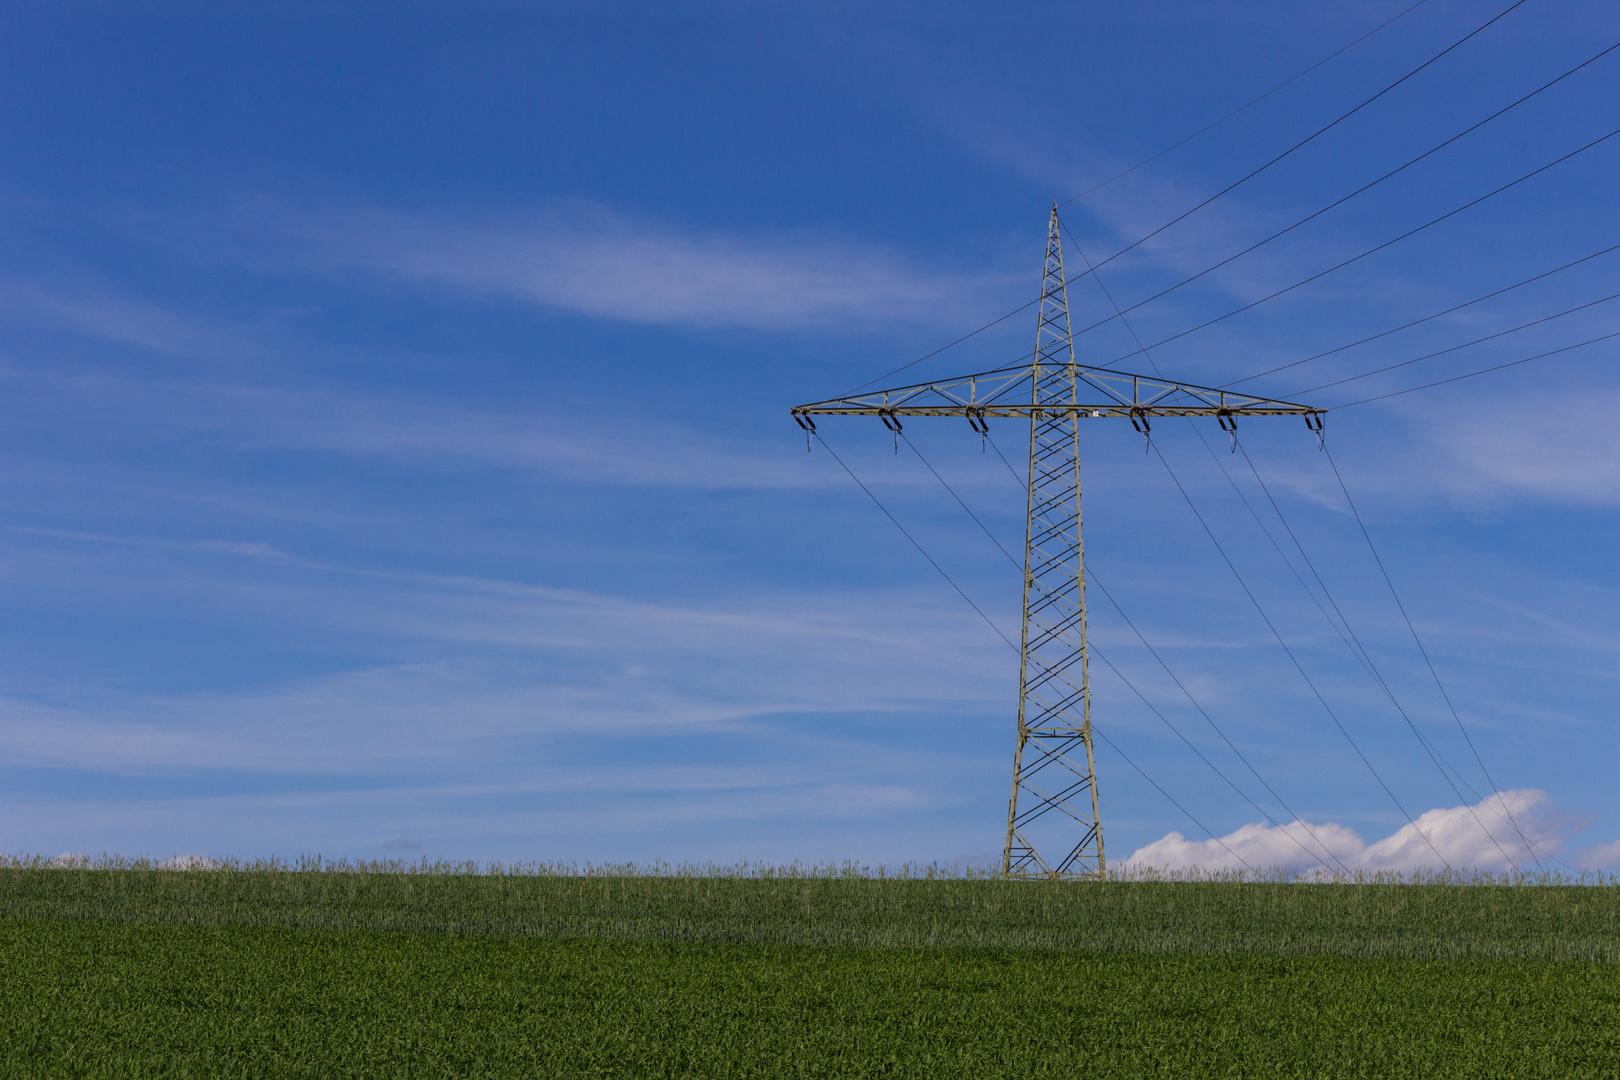 Strommast auf Feld